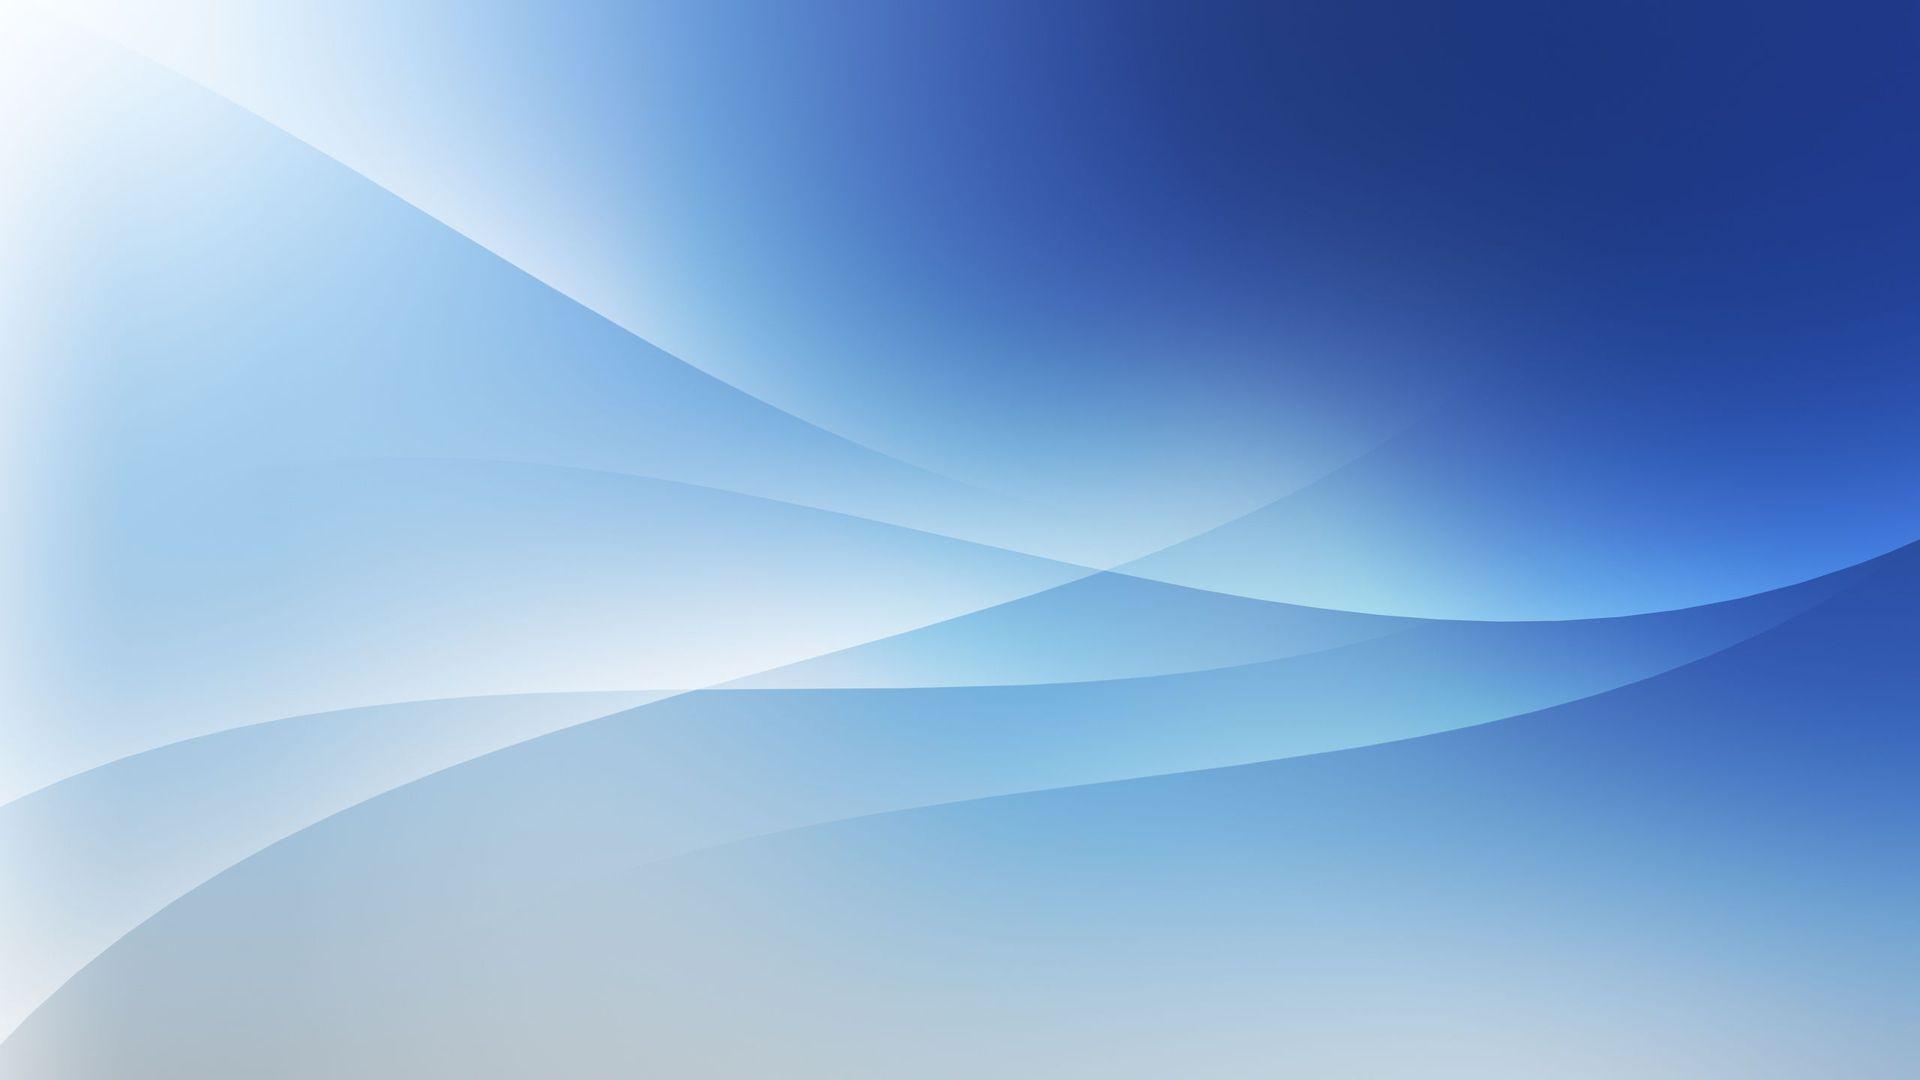 Blue and White HD Wallpaper - WallpaperSafari